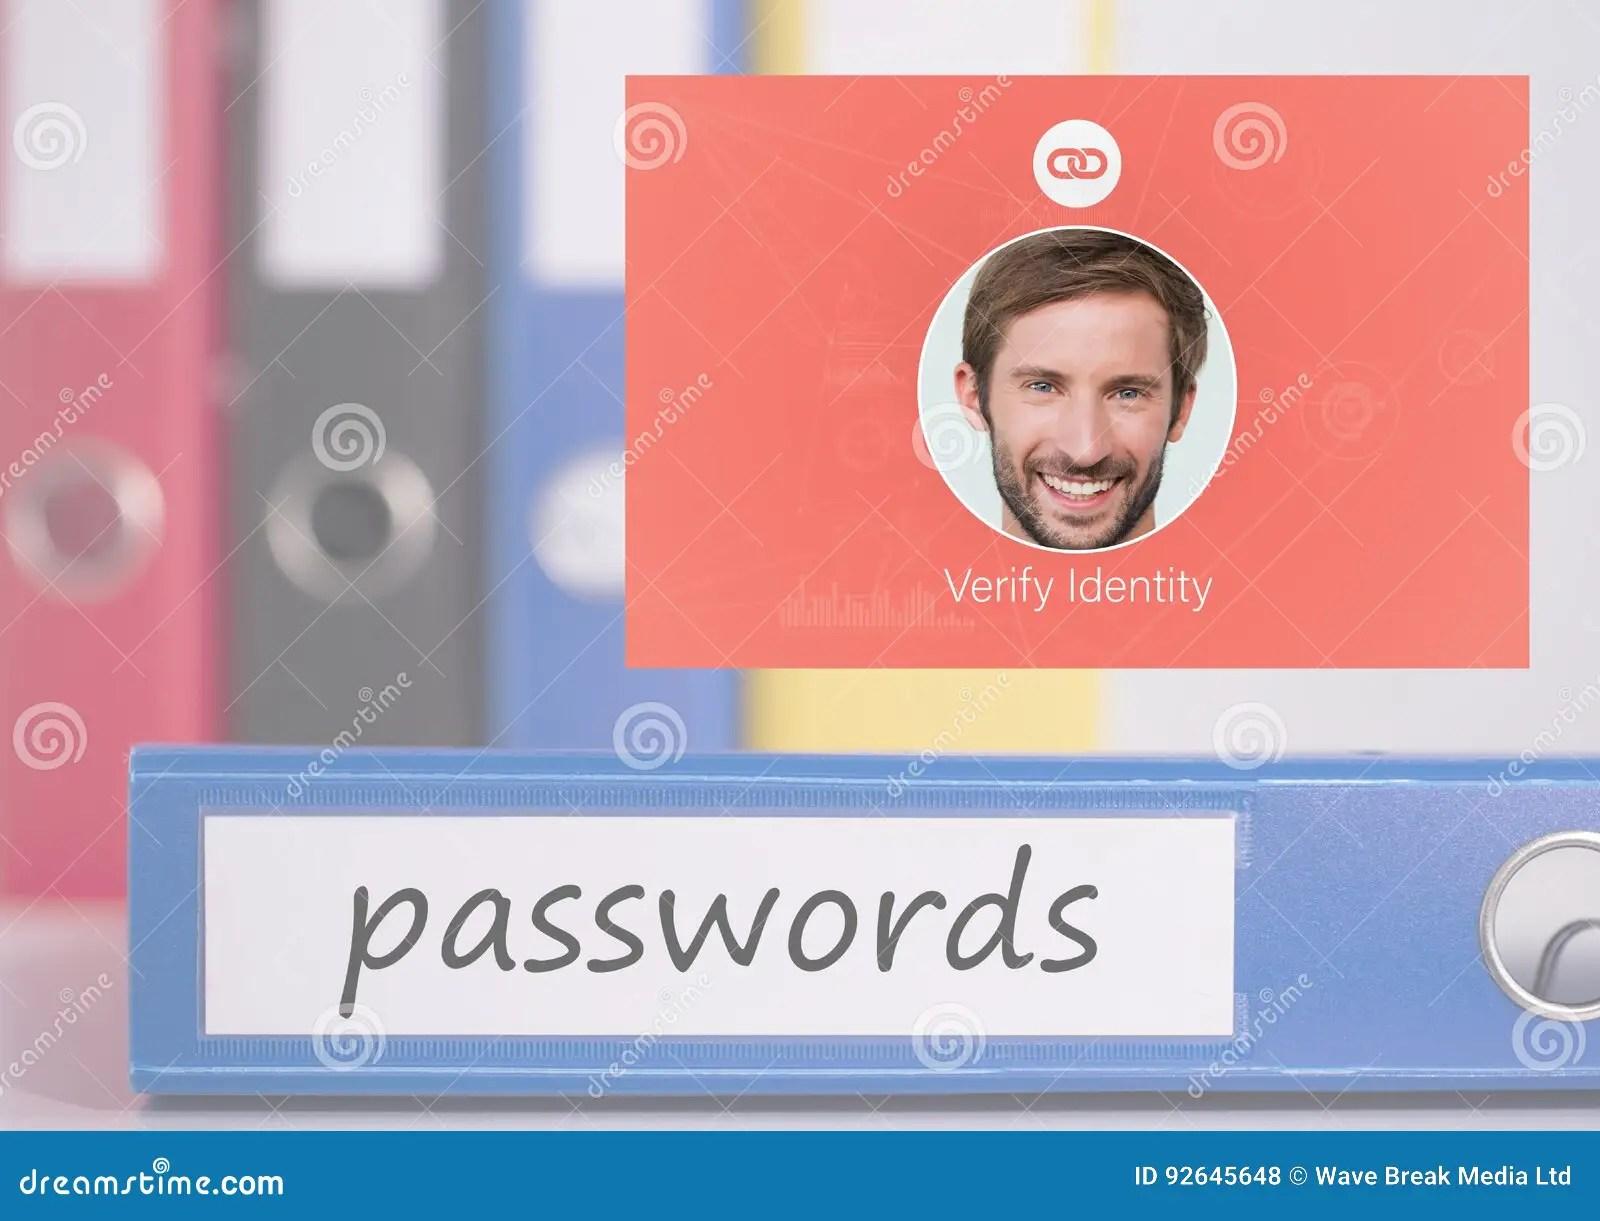 Identity Verify Passwords App Interface Stock Photo